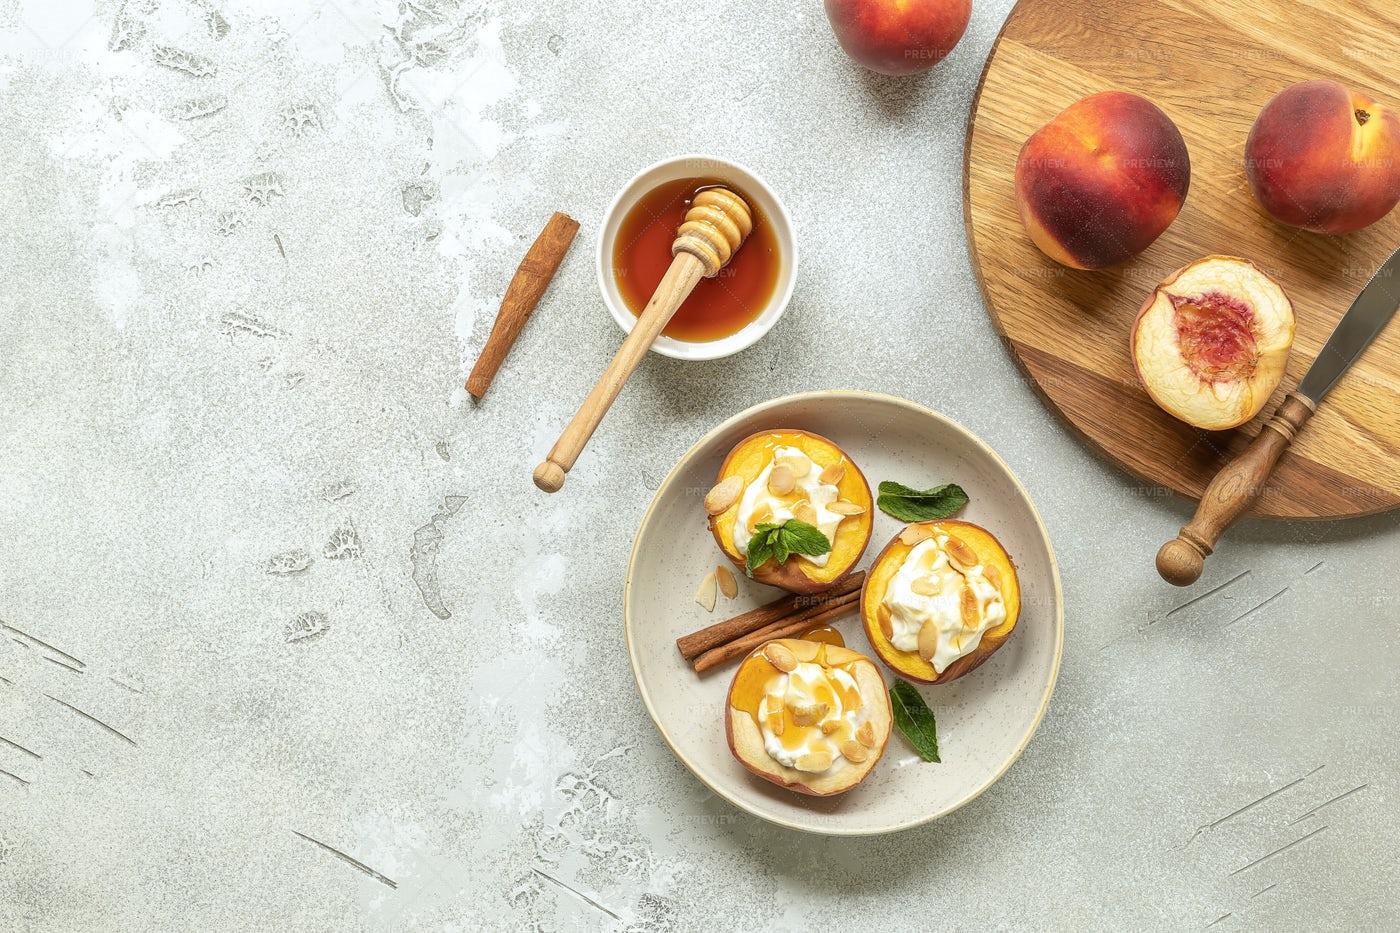 Healthy Dessert: Stock Photos